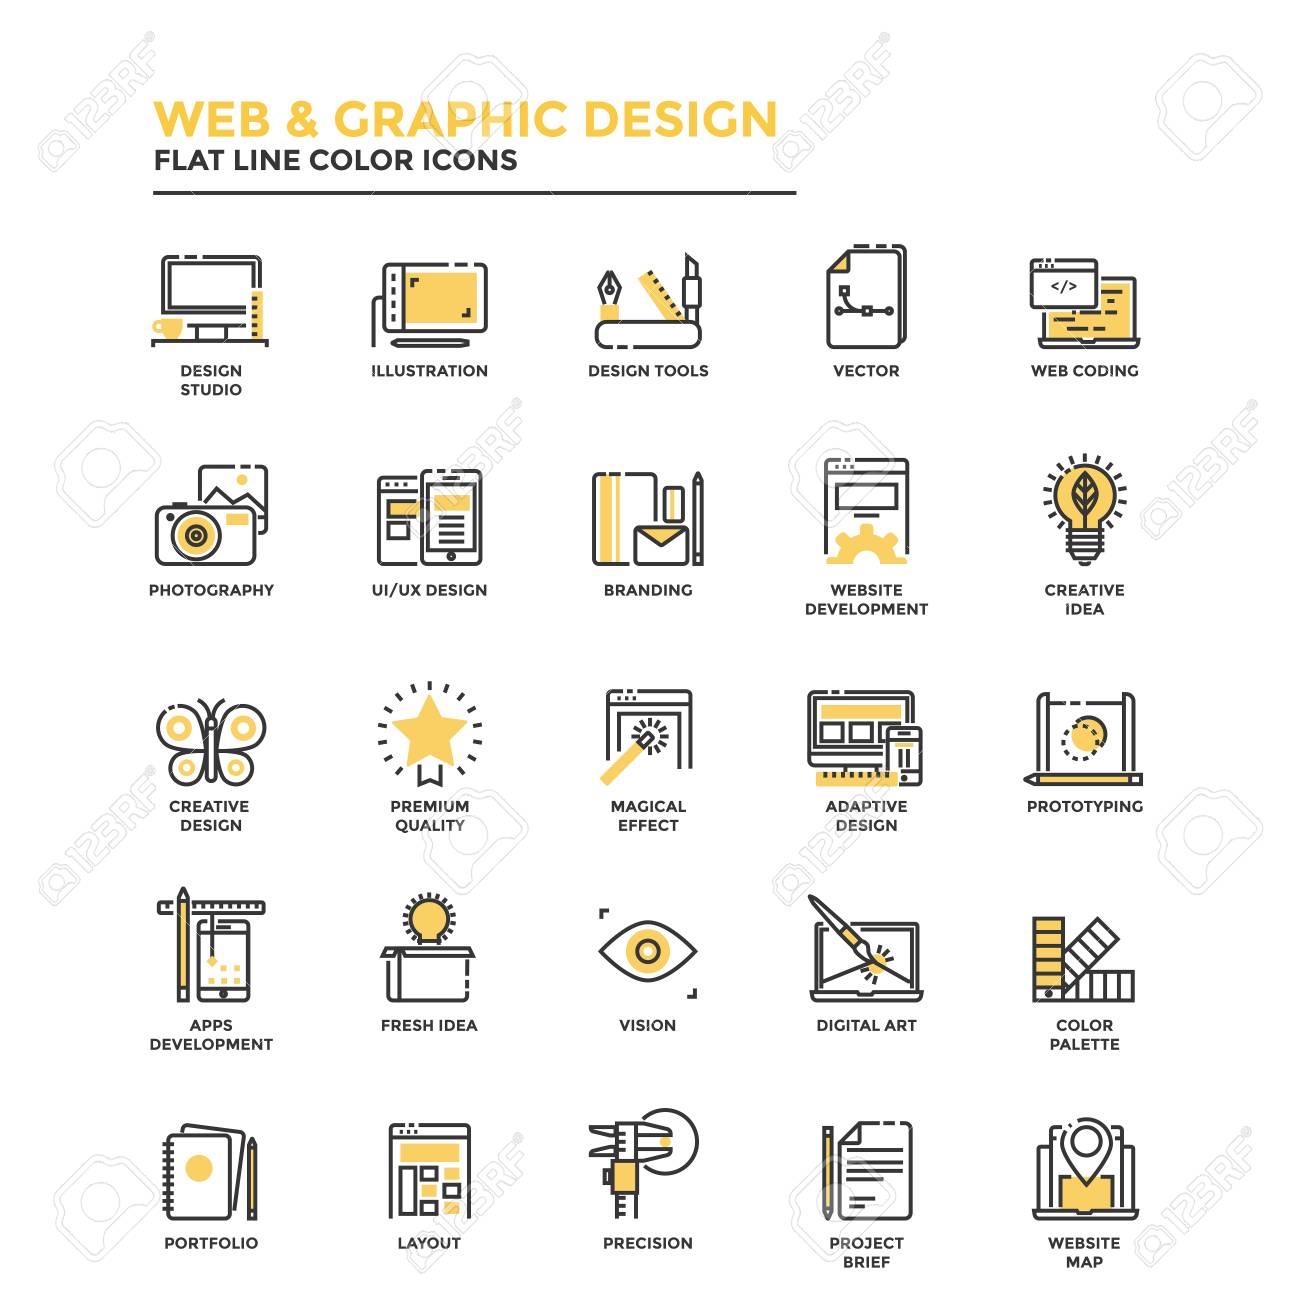 Modern flat design icons for Web and Graphic design, Illustration, Ui Design, Development, etc. Icons for web and app design, easy to use and highly customizable. Vector - 82766129